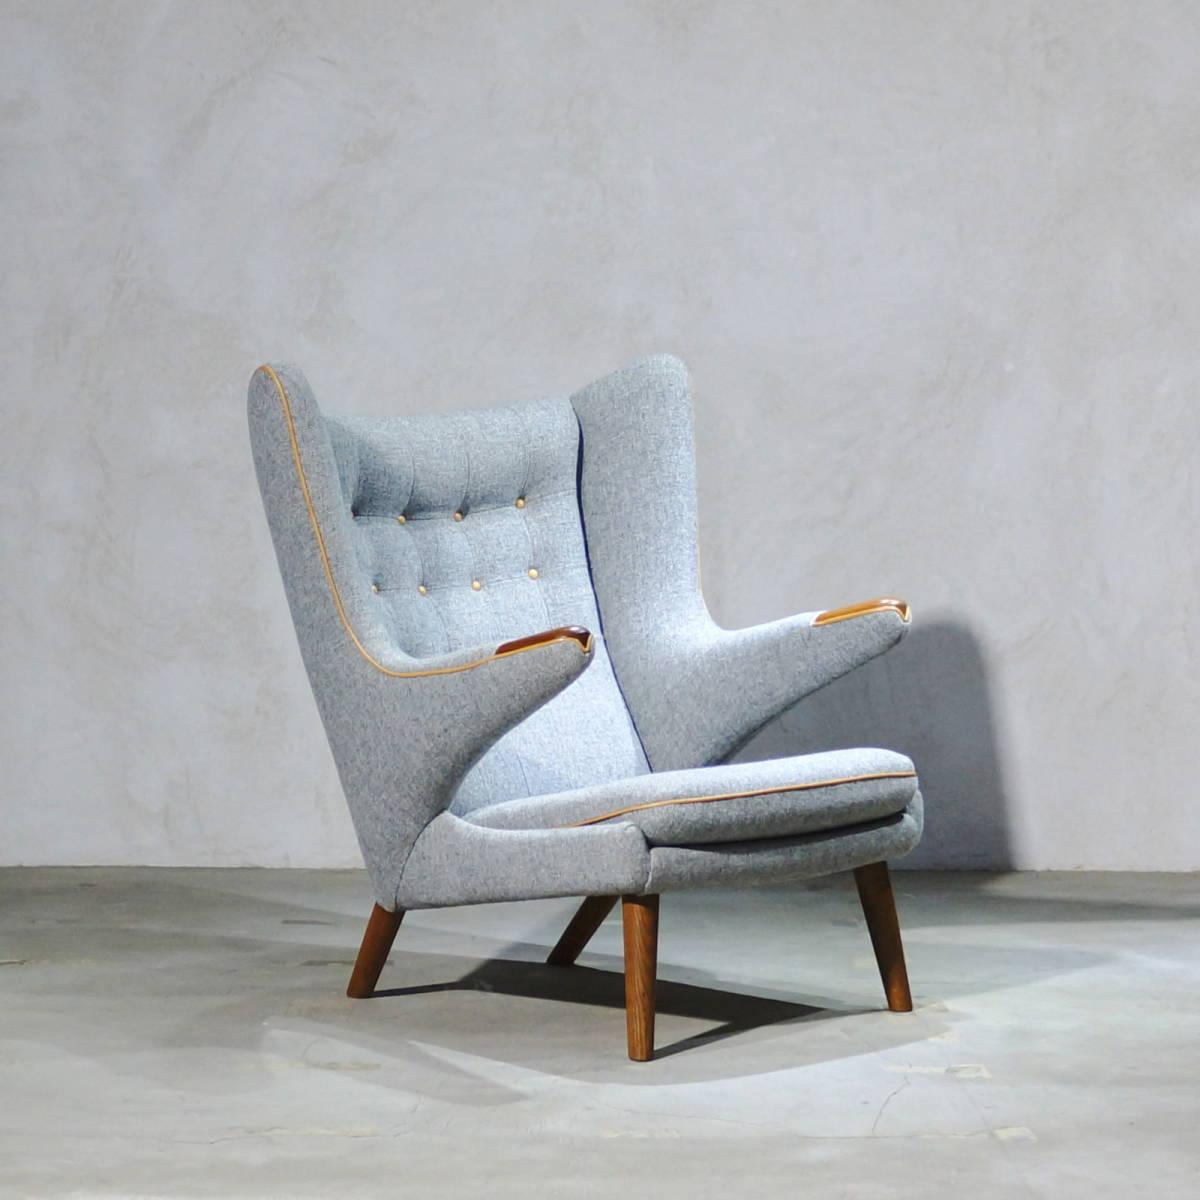 Hans J. Wegner ウェグナー AP-19 Bear Chair ベアチェア Teak & Oak チークオーク ※フィンユール モーエンセン_画像6